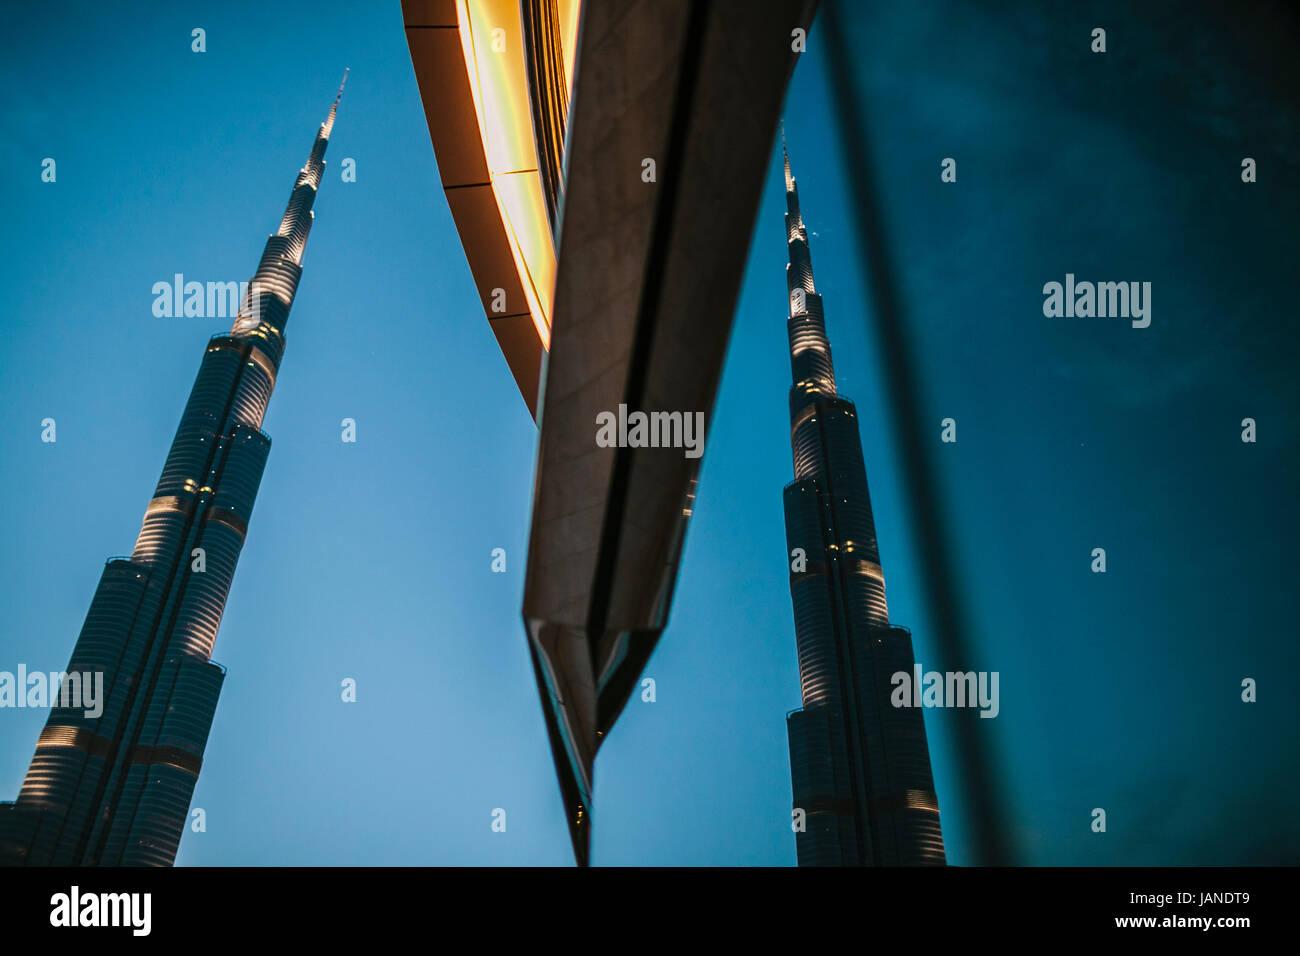 Reflexion des Burj Khalifa, Dubai, Vereinigte Arabische Emirate Stockfoto